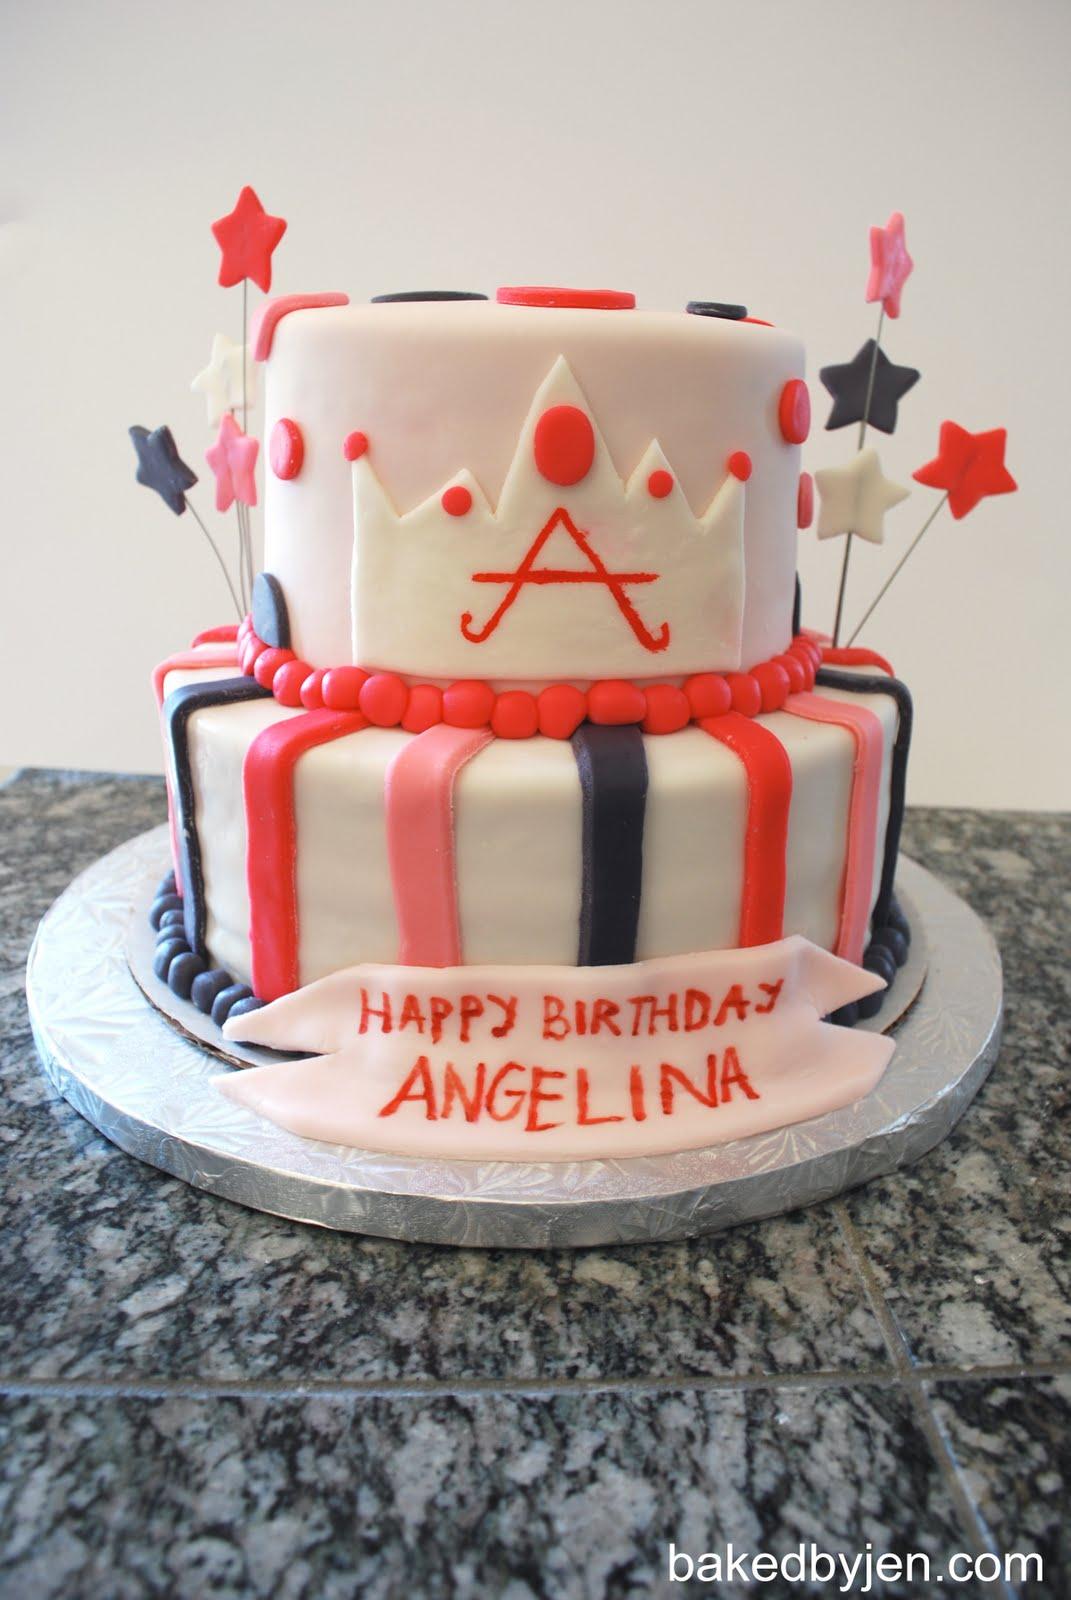 Homemade Birthday Cakes For Boyfriend Cake 2 of 2 was a birthday